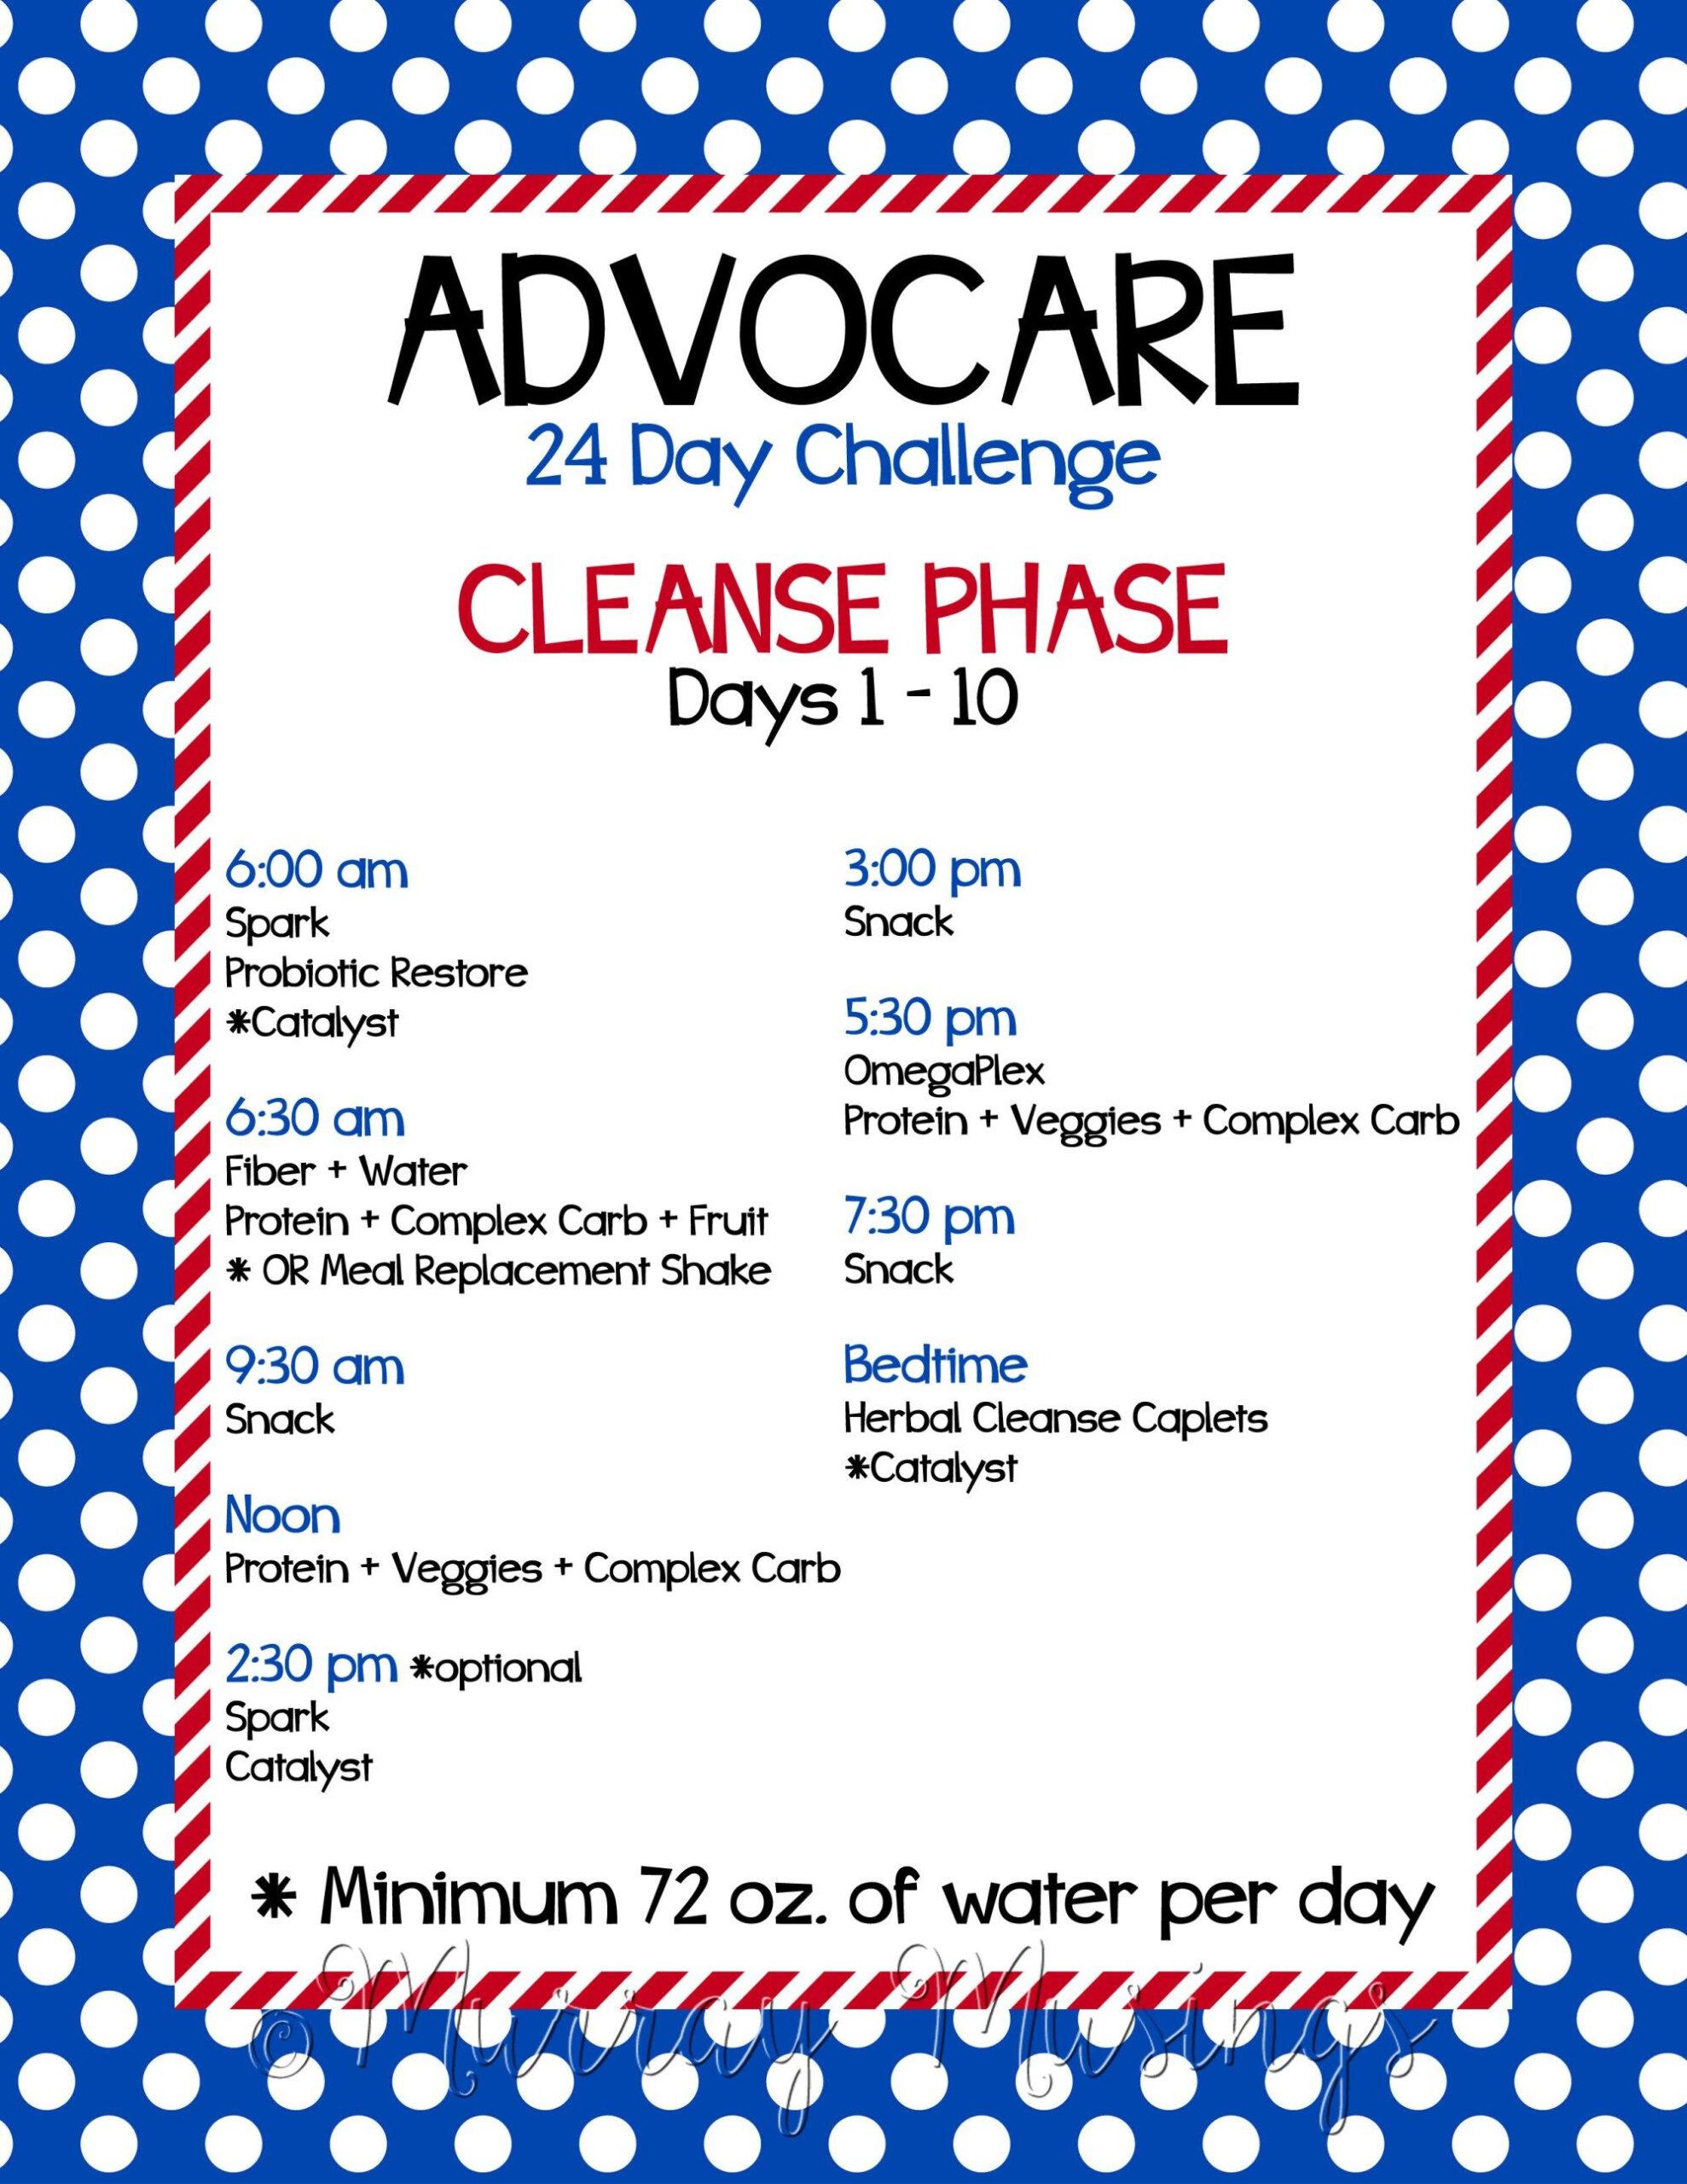 Advocare 24 Day Challenge Calendar | Printable Calendar with Track 4 Calendar Wake County